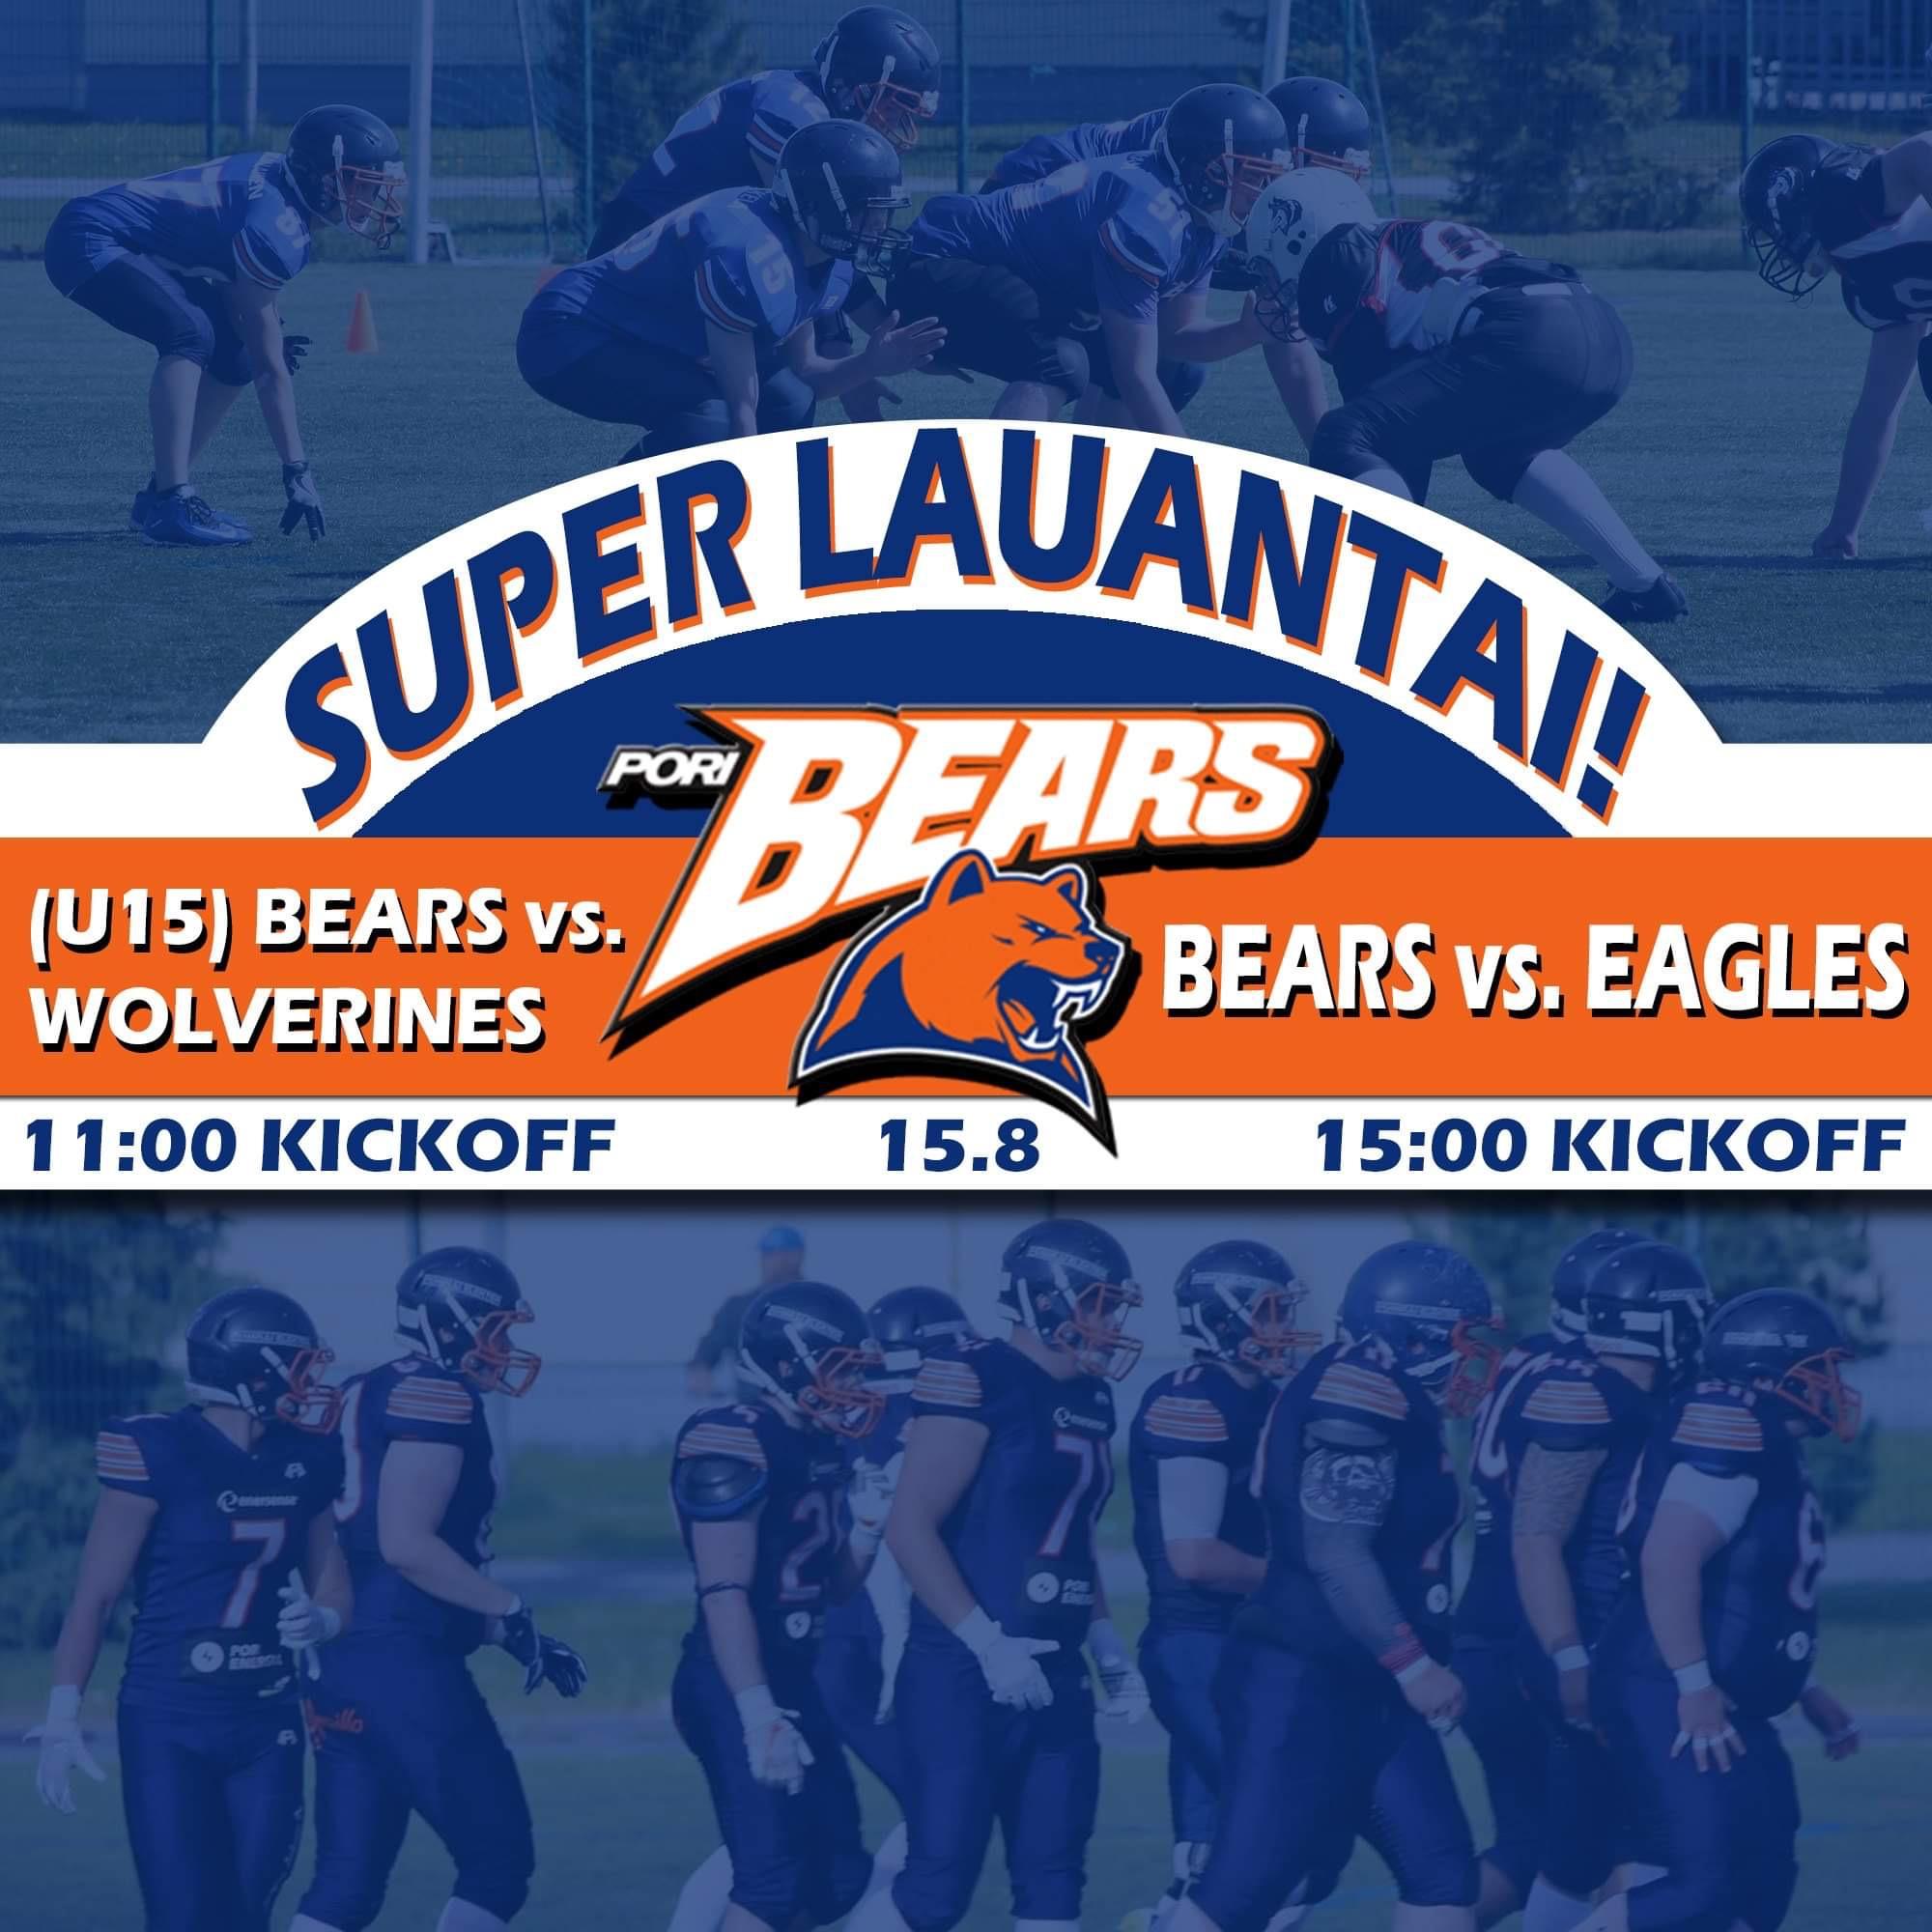 Bears Super Lauantai